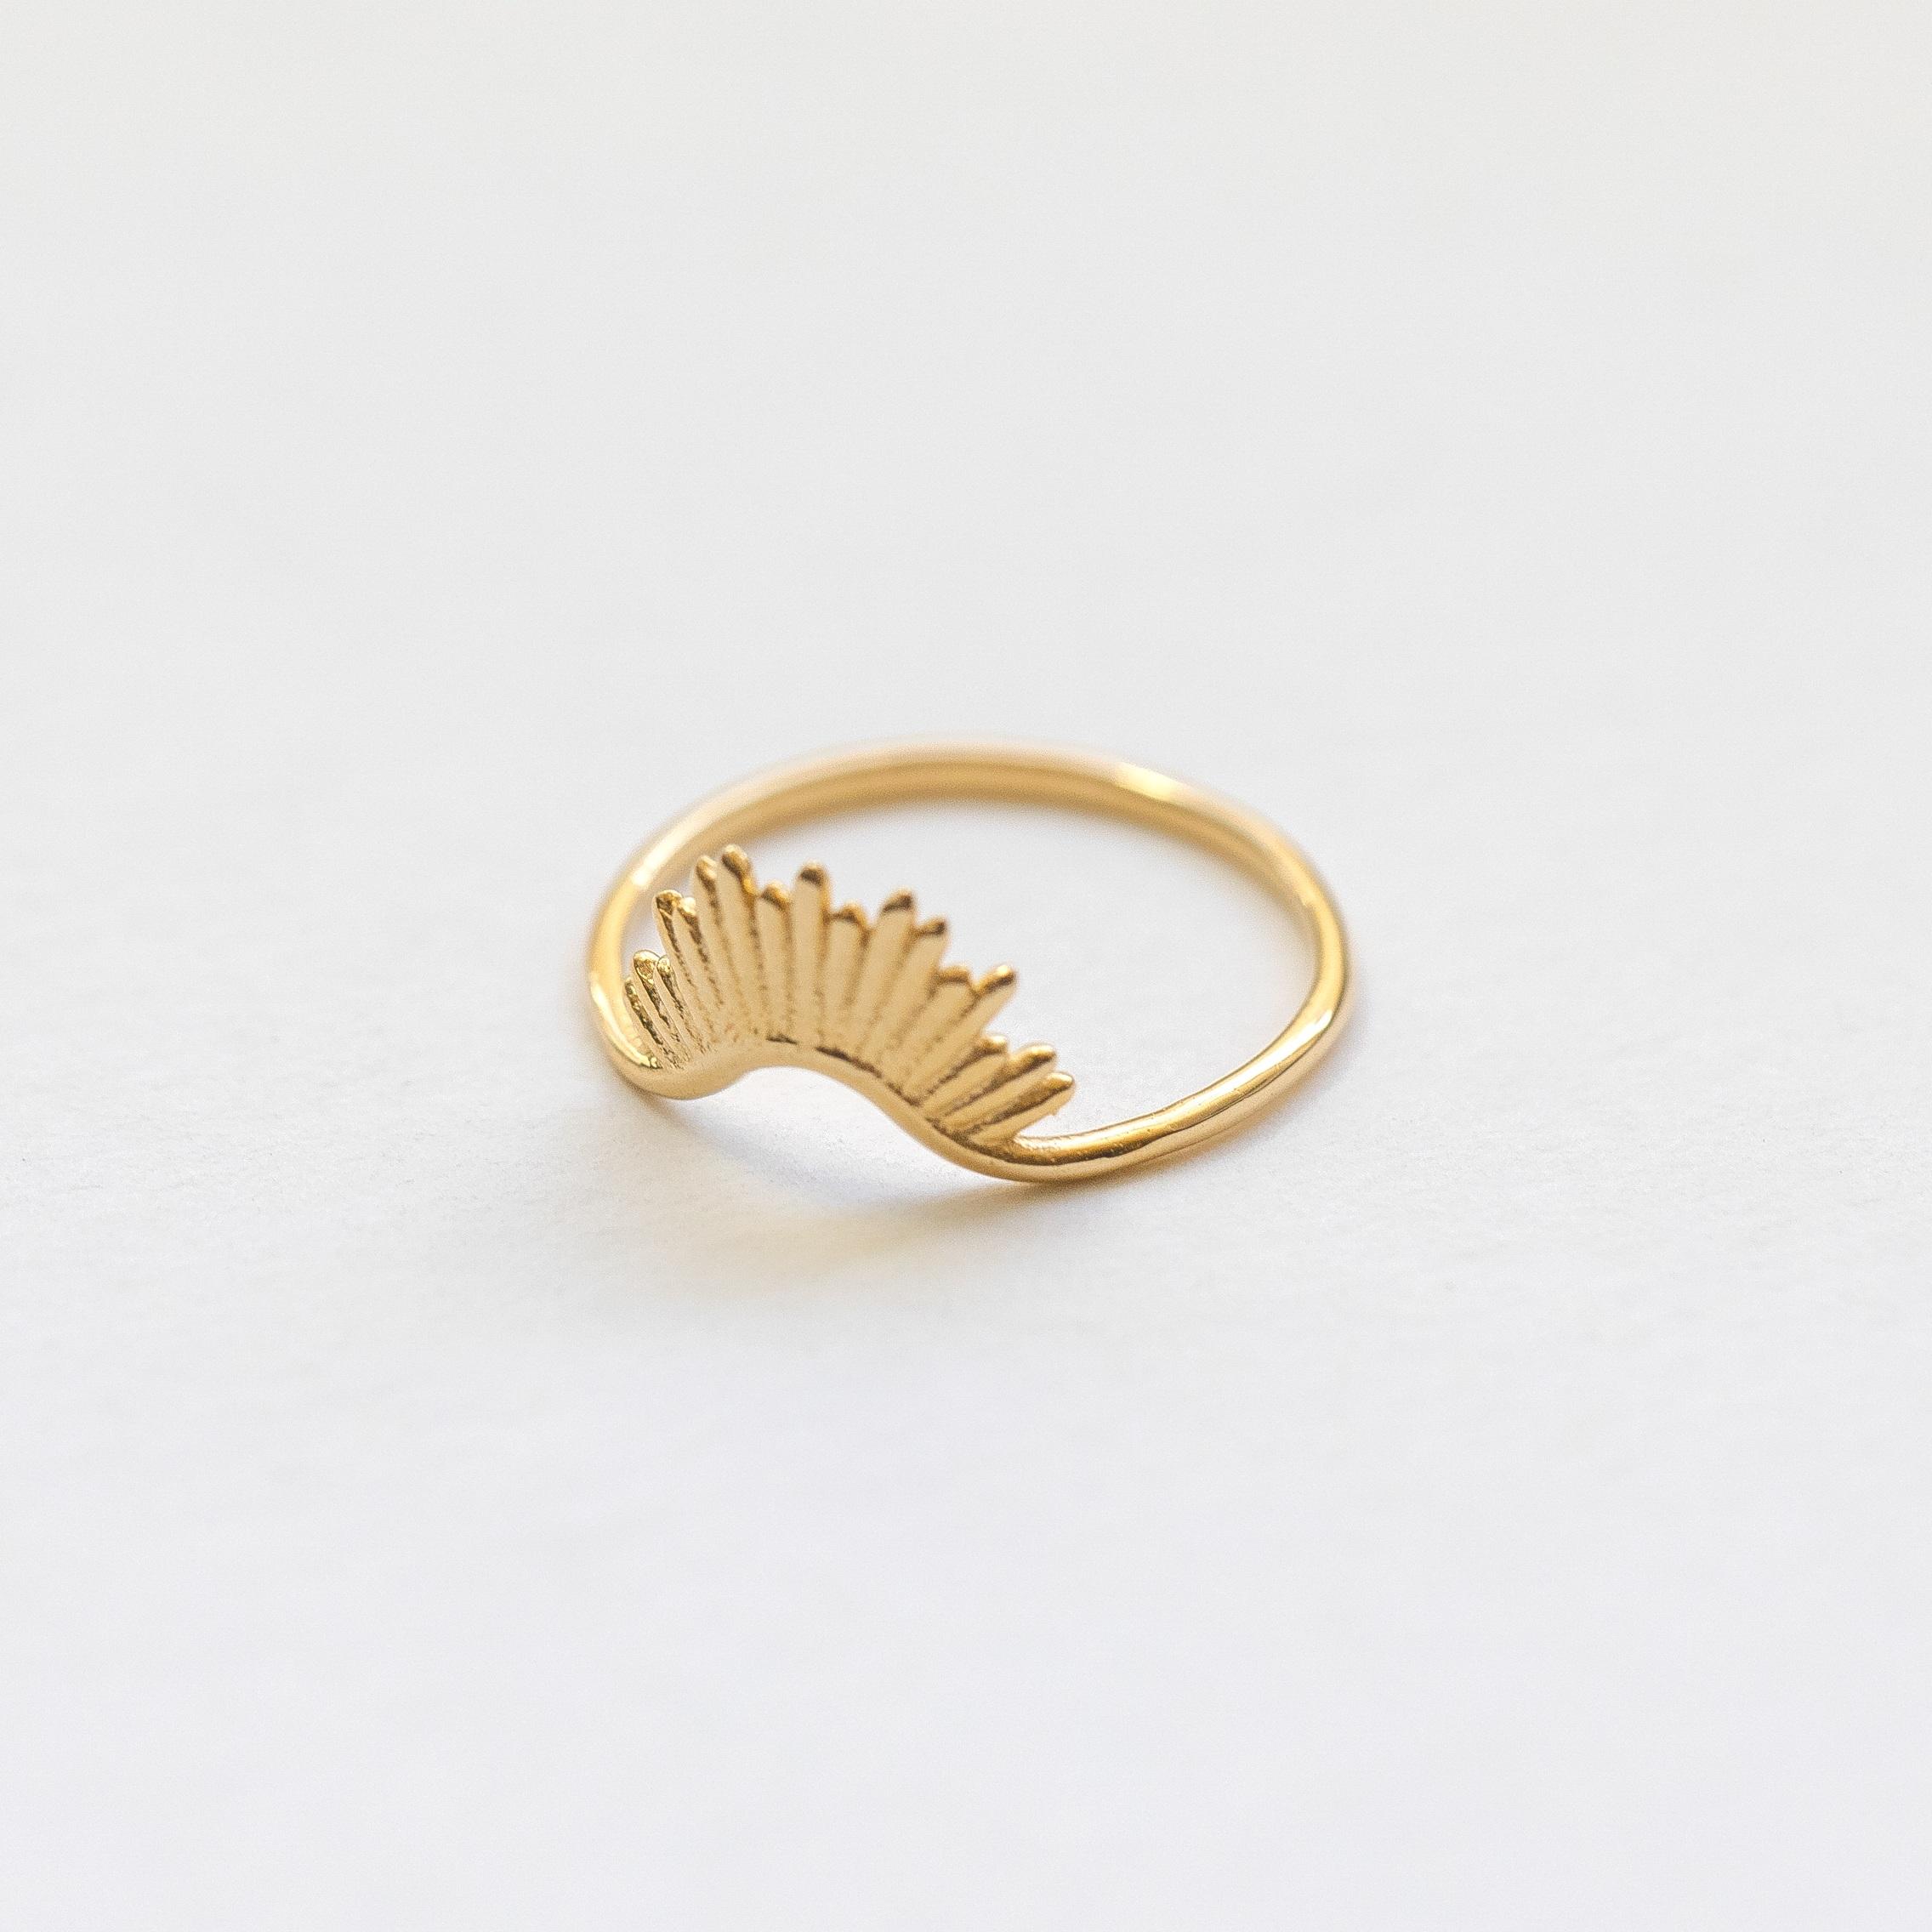 engagement ring rising sun ring solid 14K gold ring circle ring 585 gold Sterling silver ring.